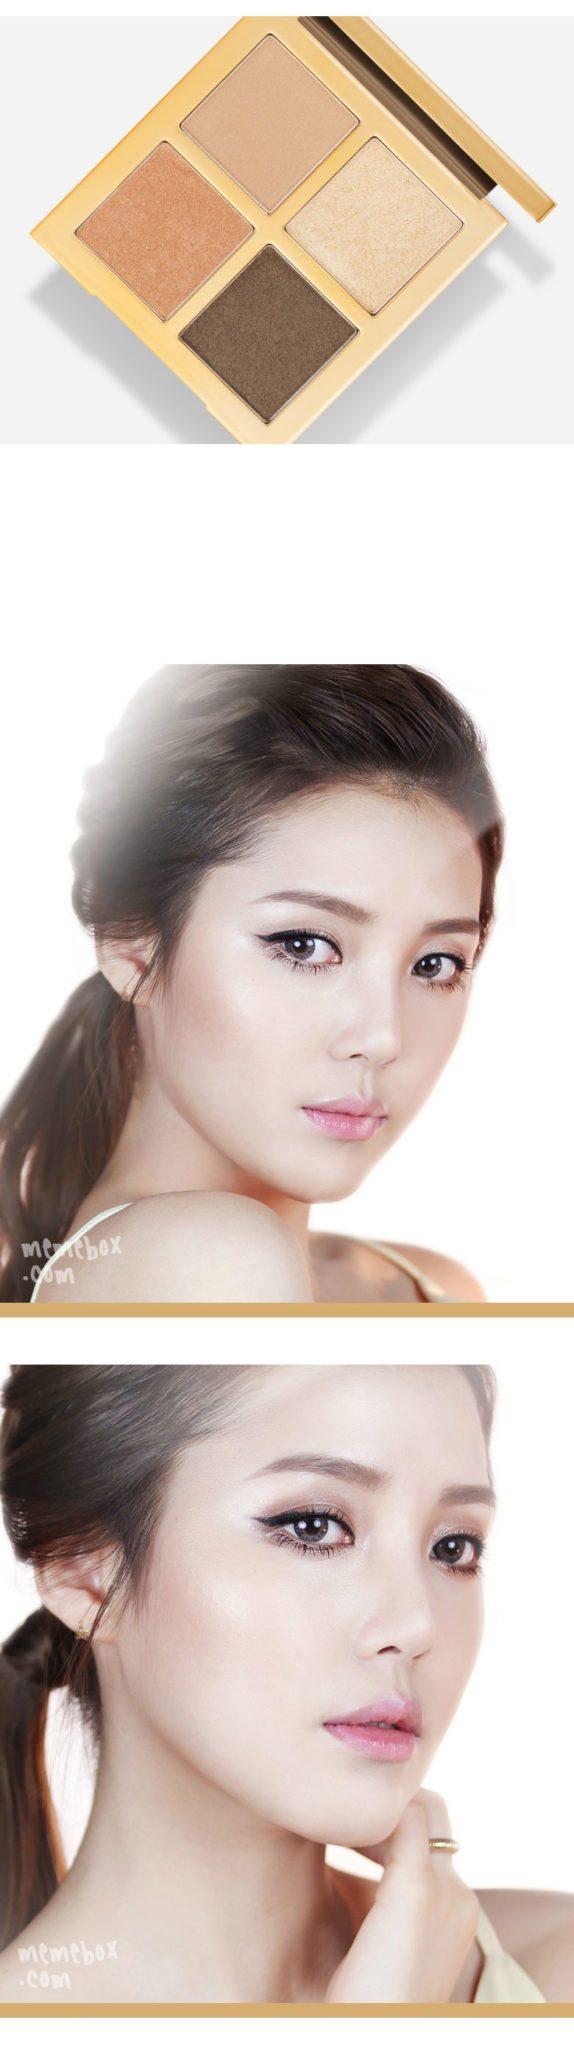 MEMEBOX x PONY Shine Easy Glam Eyeshadow Palette 3 malaysia singapore indonesia philippine canada australia1